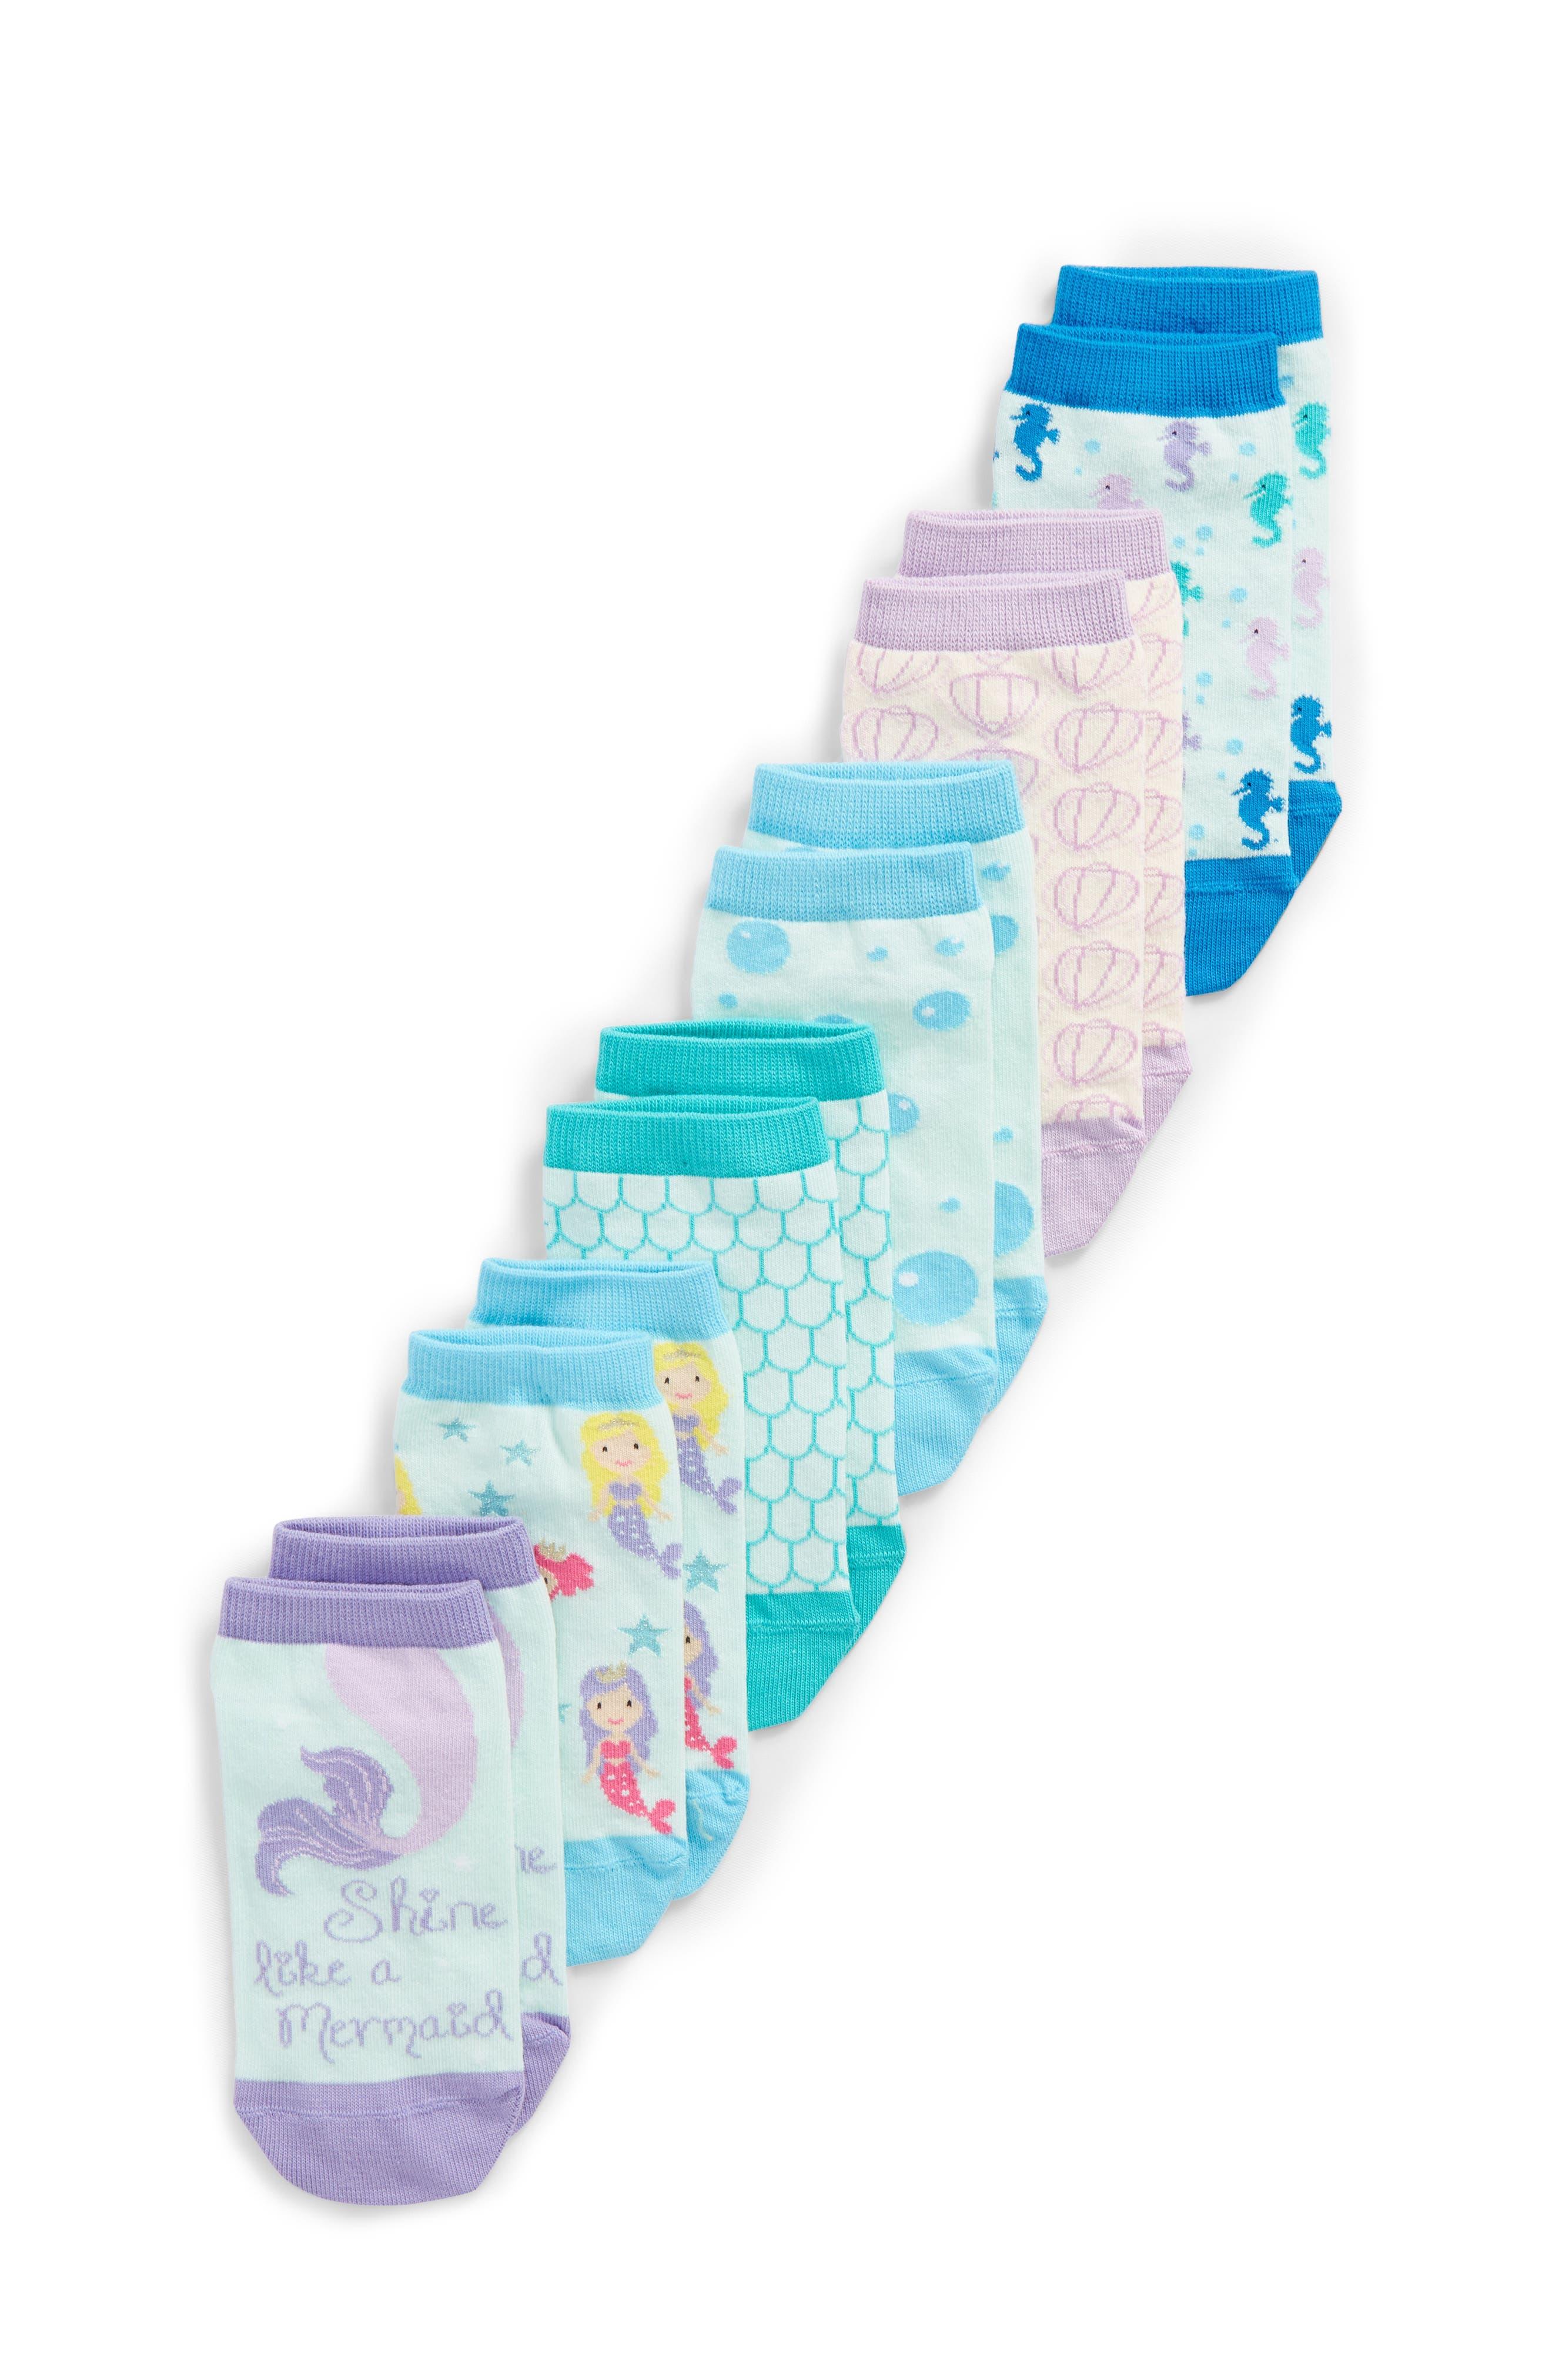 6-Pack Mermaid Low Cut Socks,                             Main thumbnail 1, color,                             Blue Multi